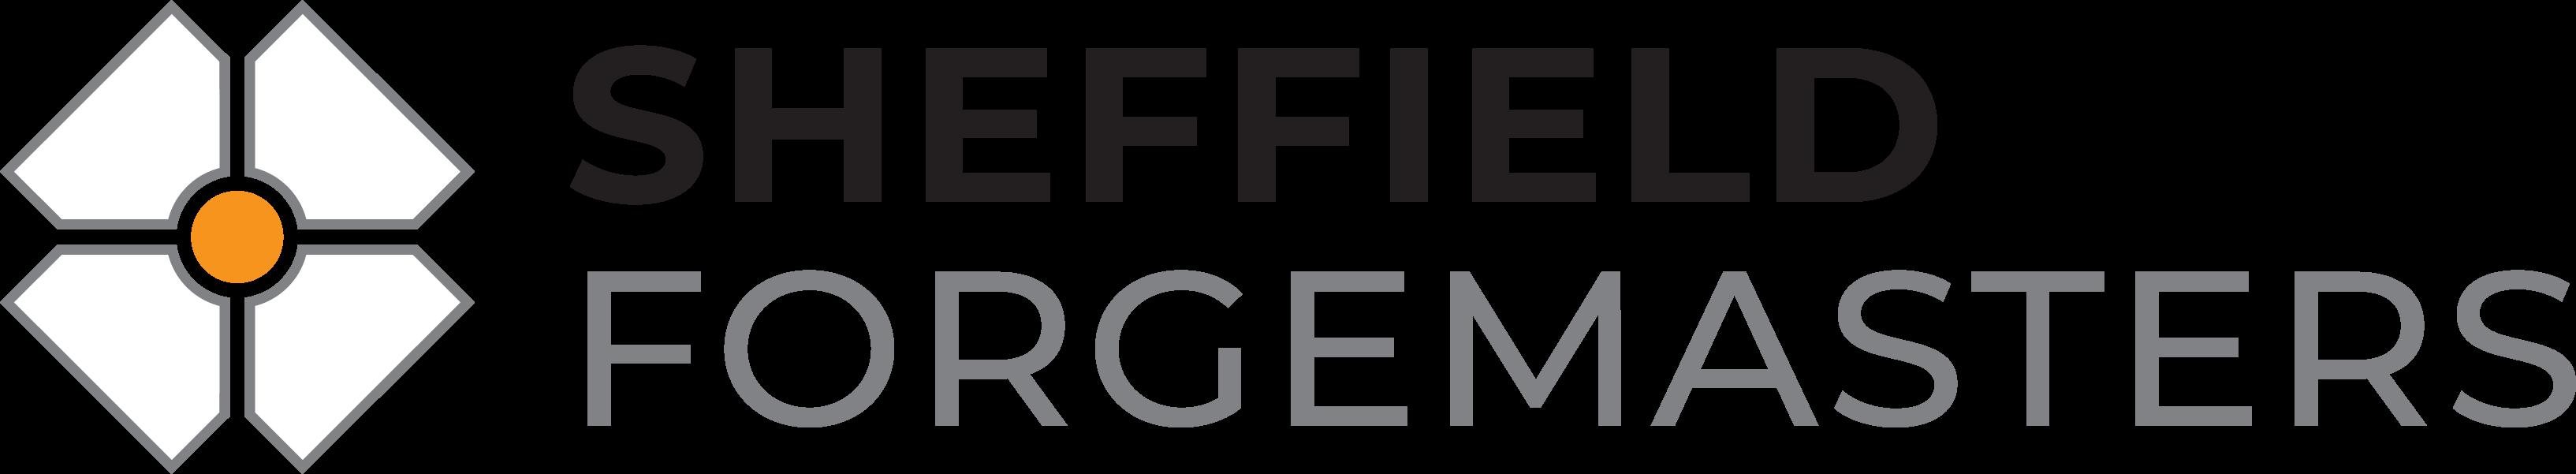 Sheffield Forgemasters Logo